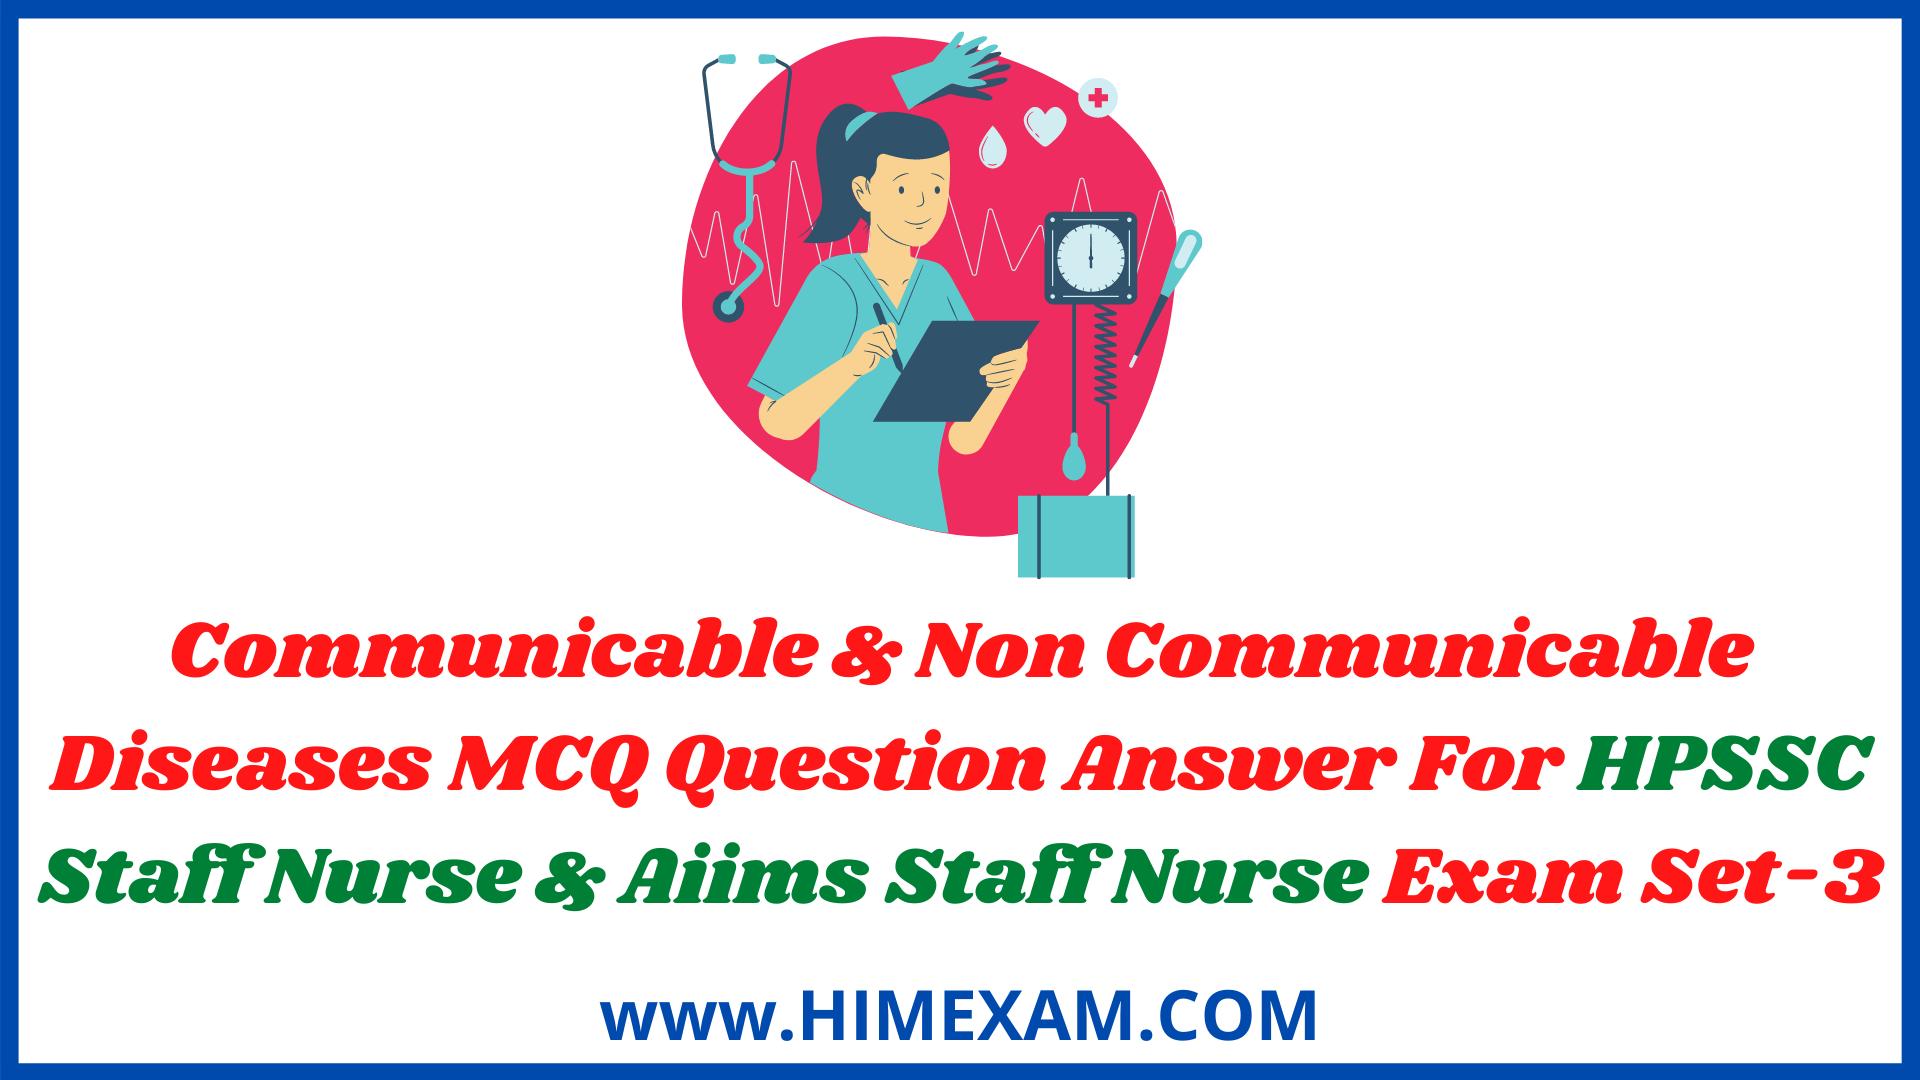 Communicable & Non Communicable Diseases MCQ Question Answer For HPSSC Staff Nurse & Aiims Staff Nurse Exam Set-3